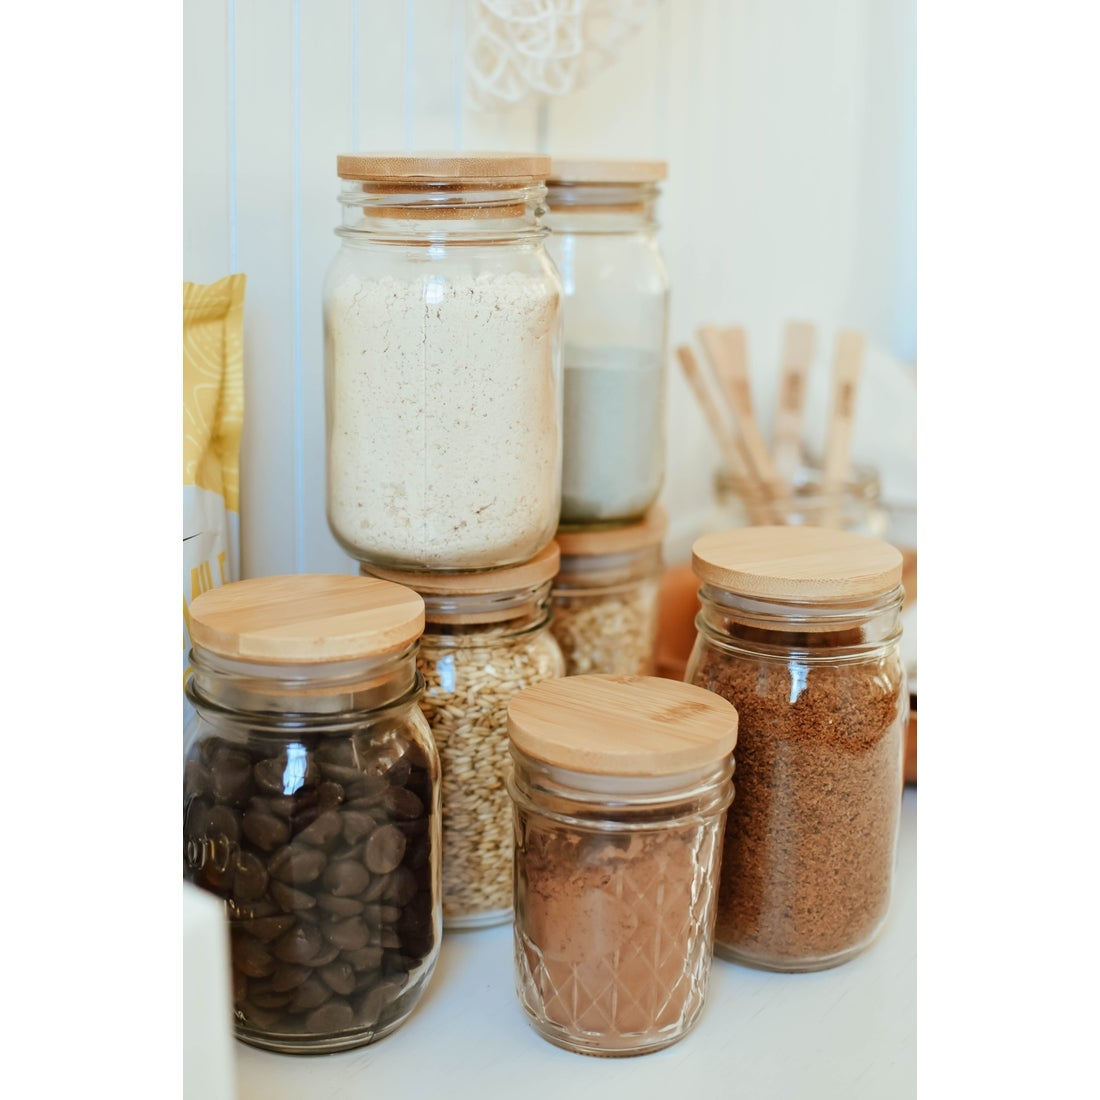 Image of Wood Mason Jar Lids